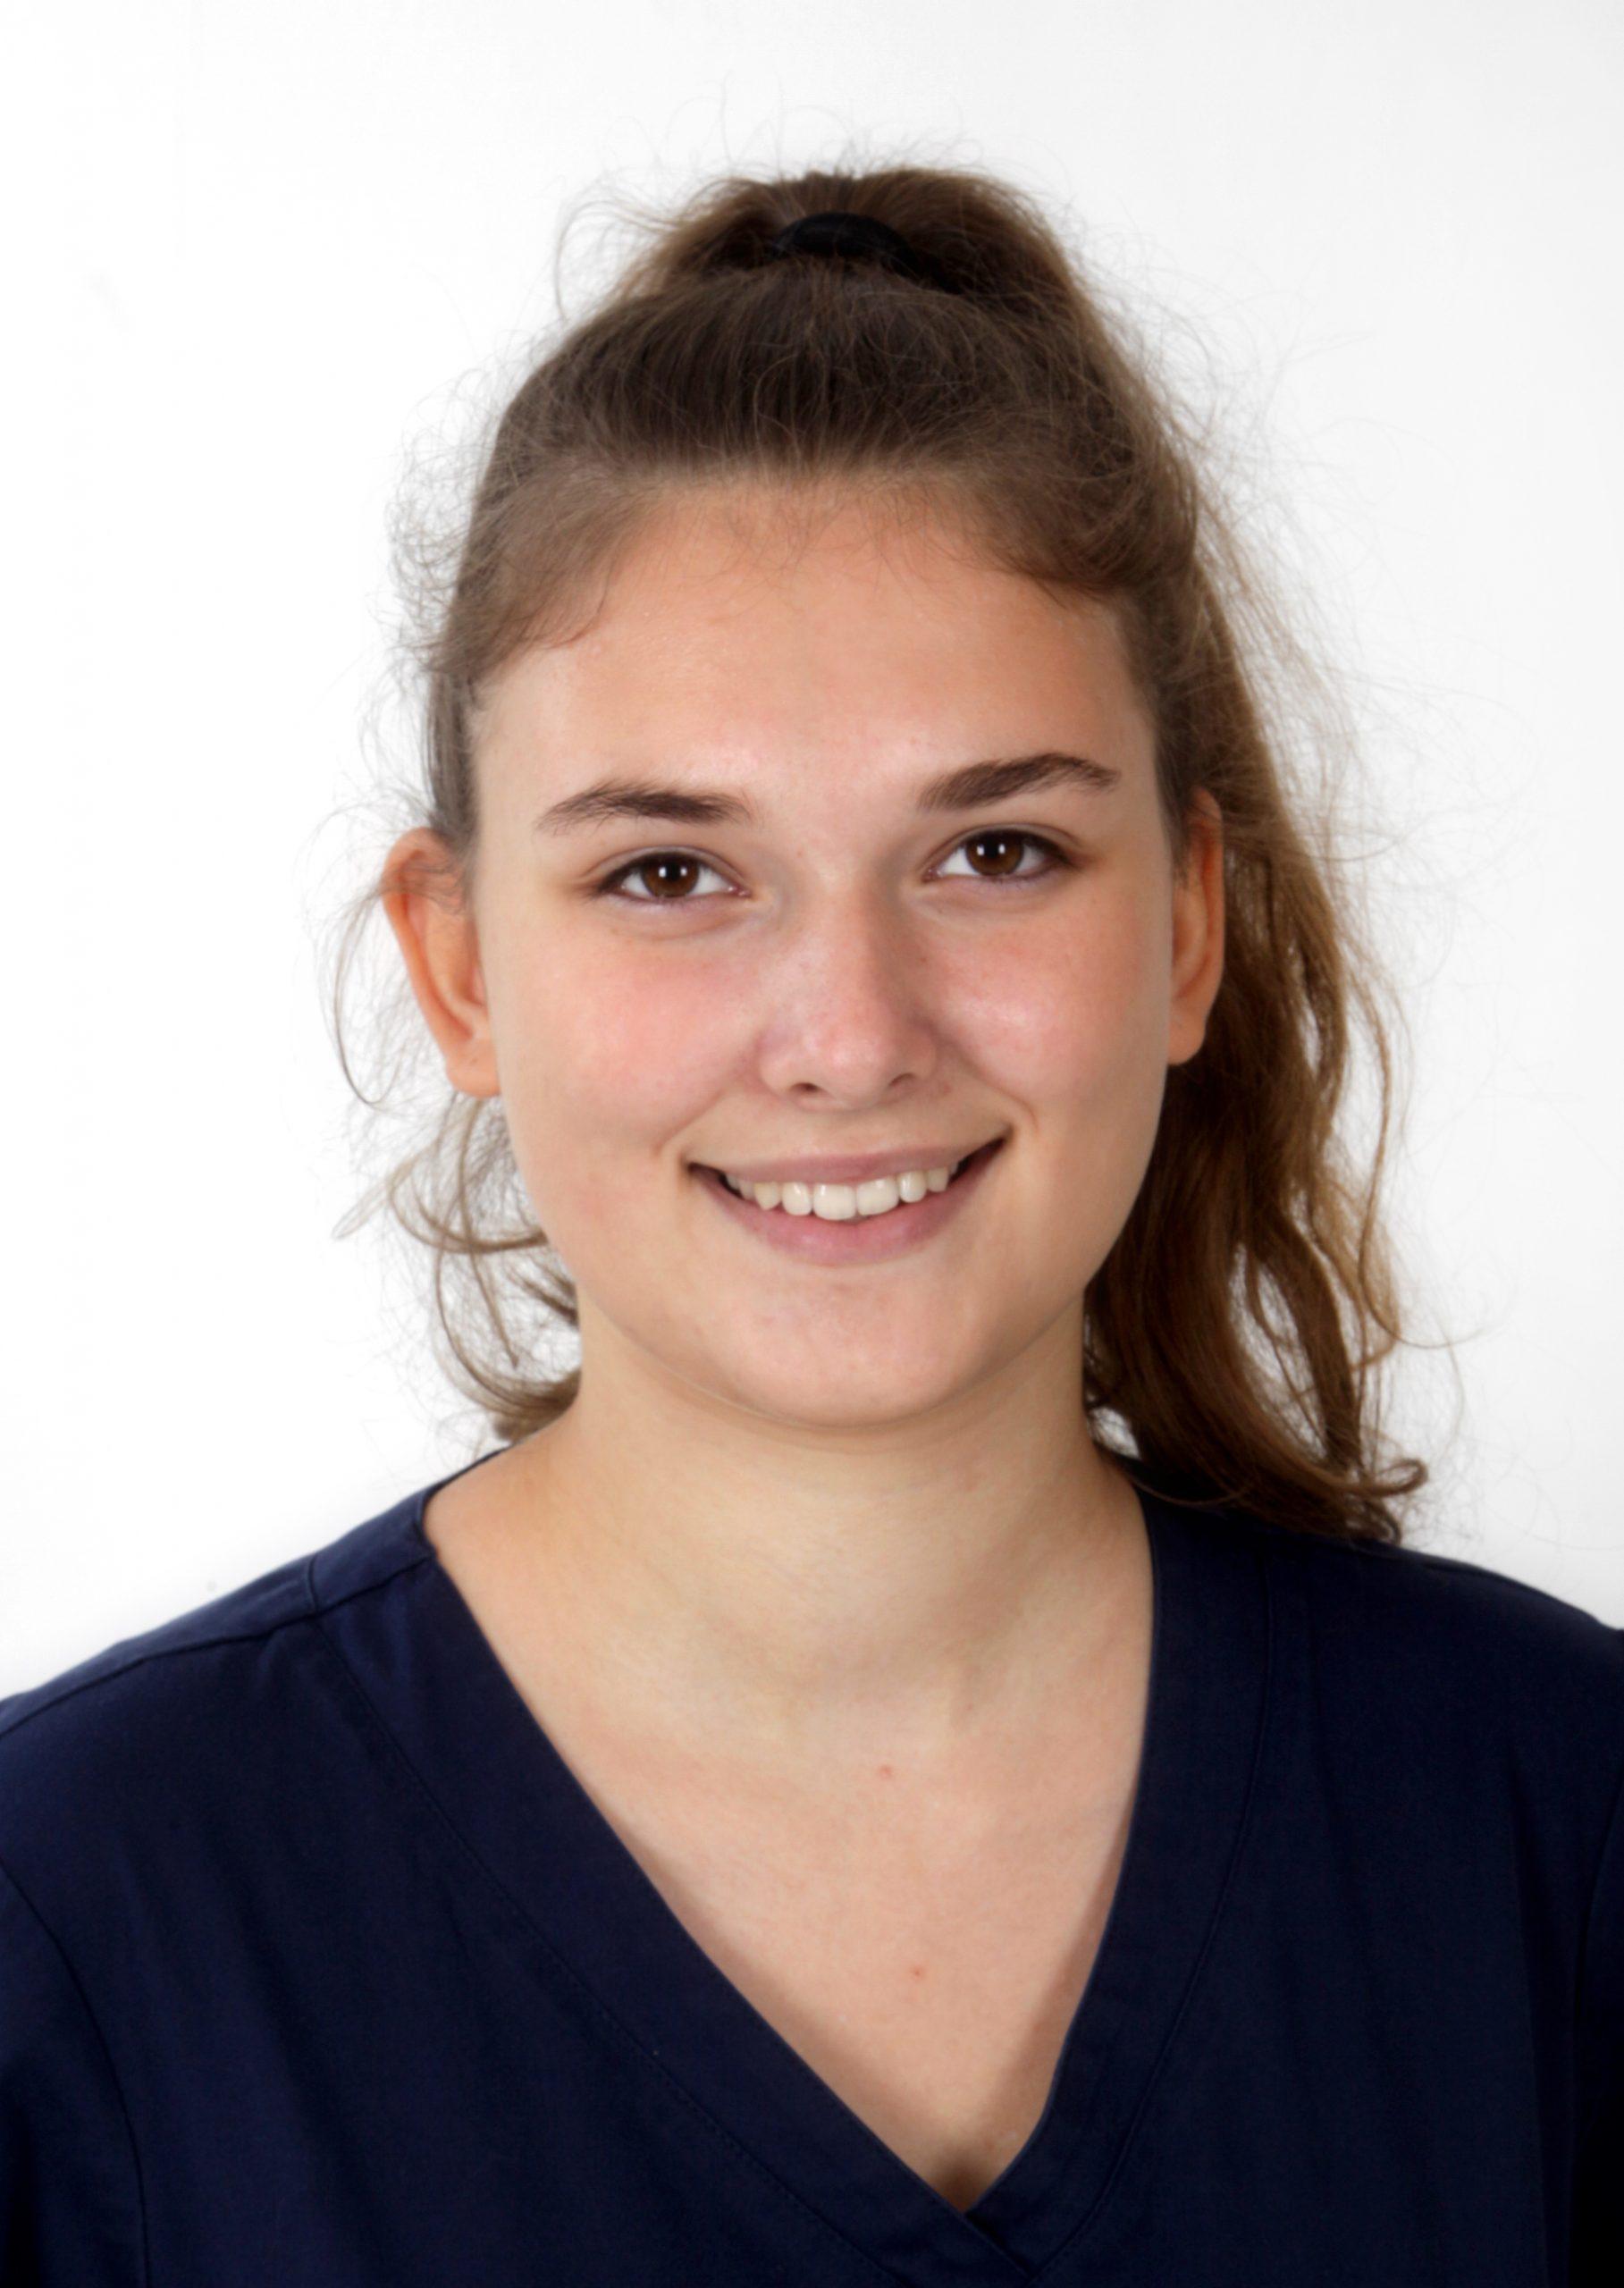 Elaine Johannsen